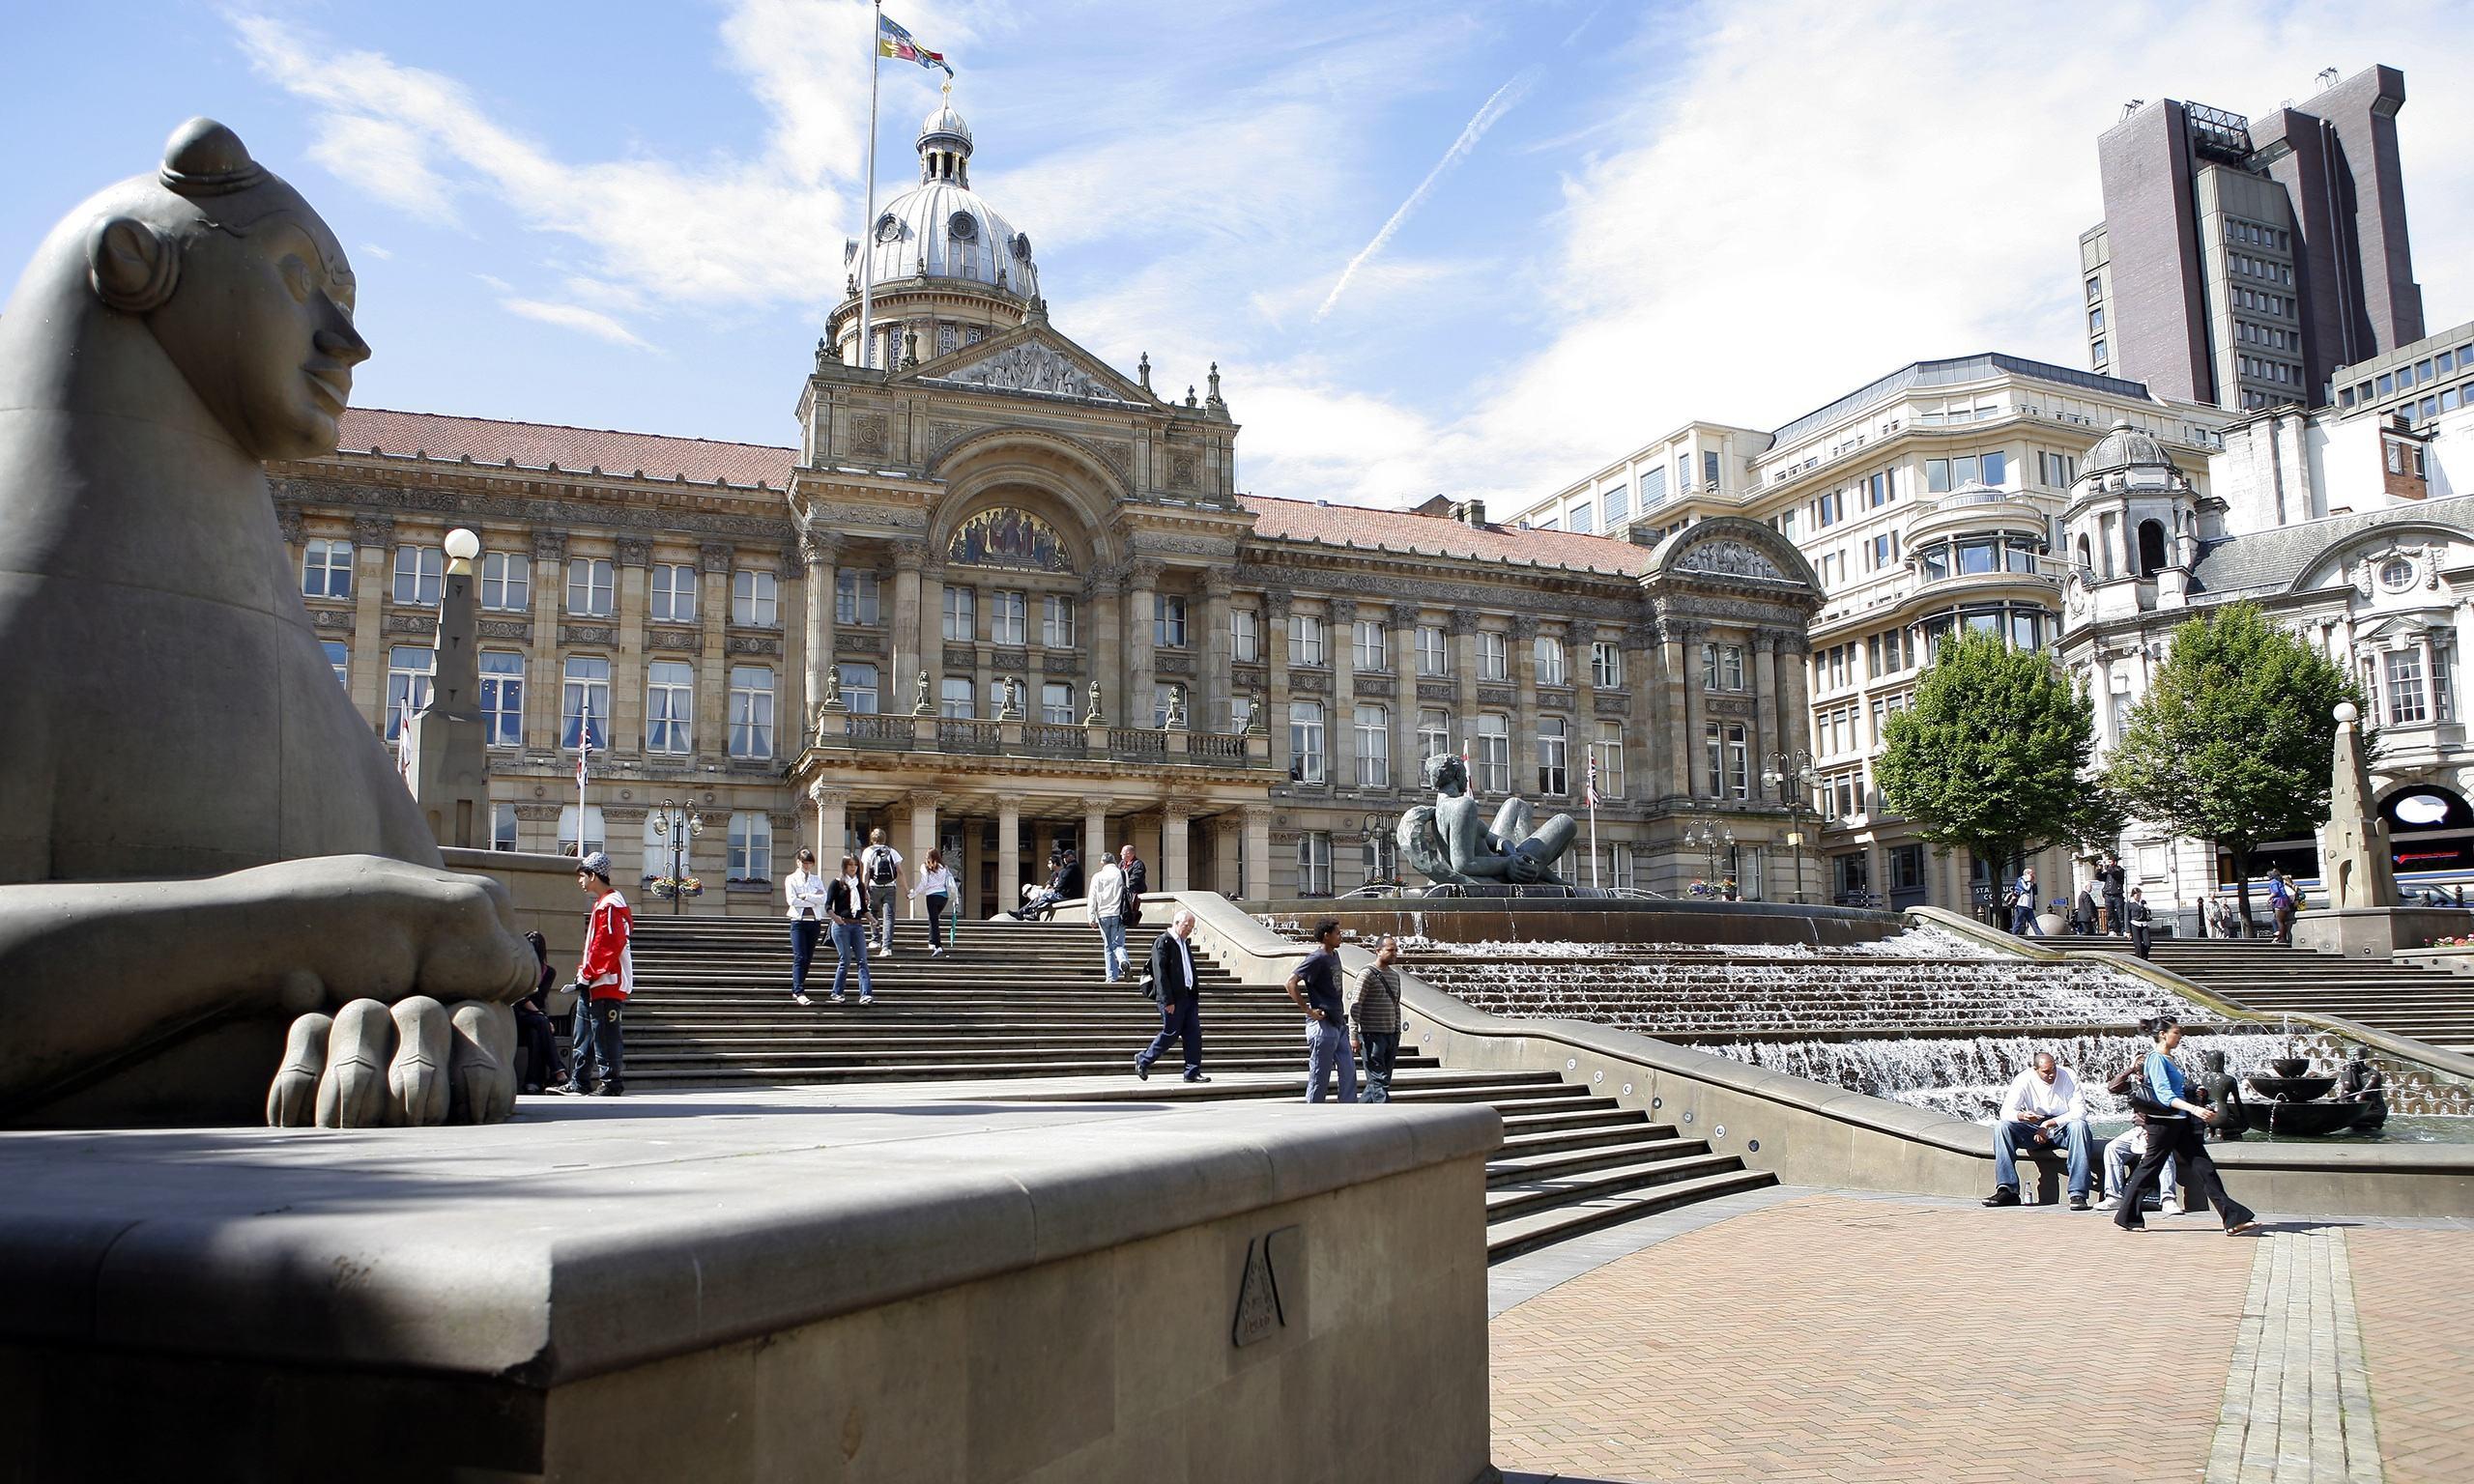 birmingham council must make capita contract open or risk